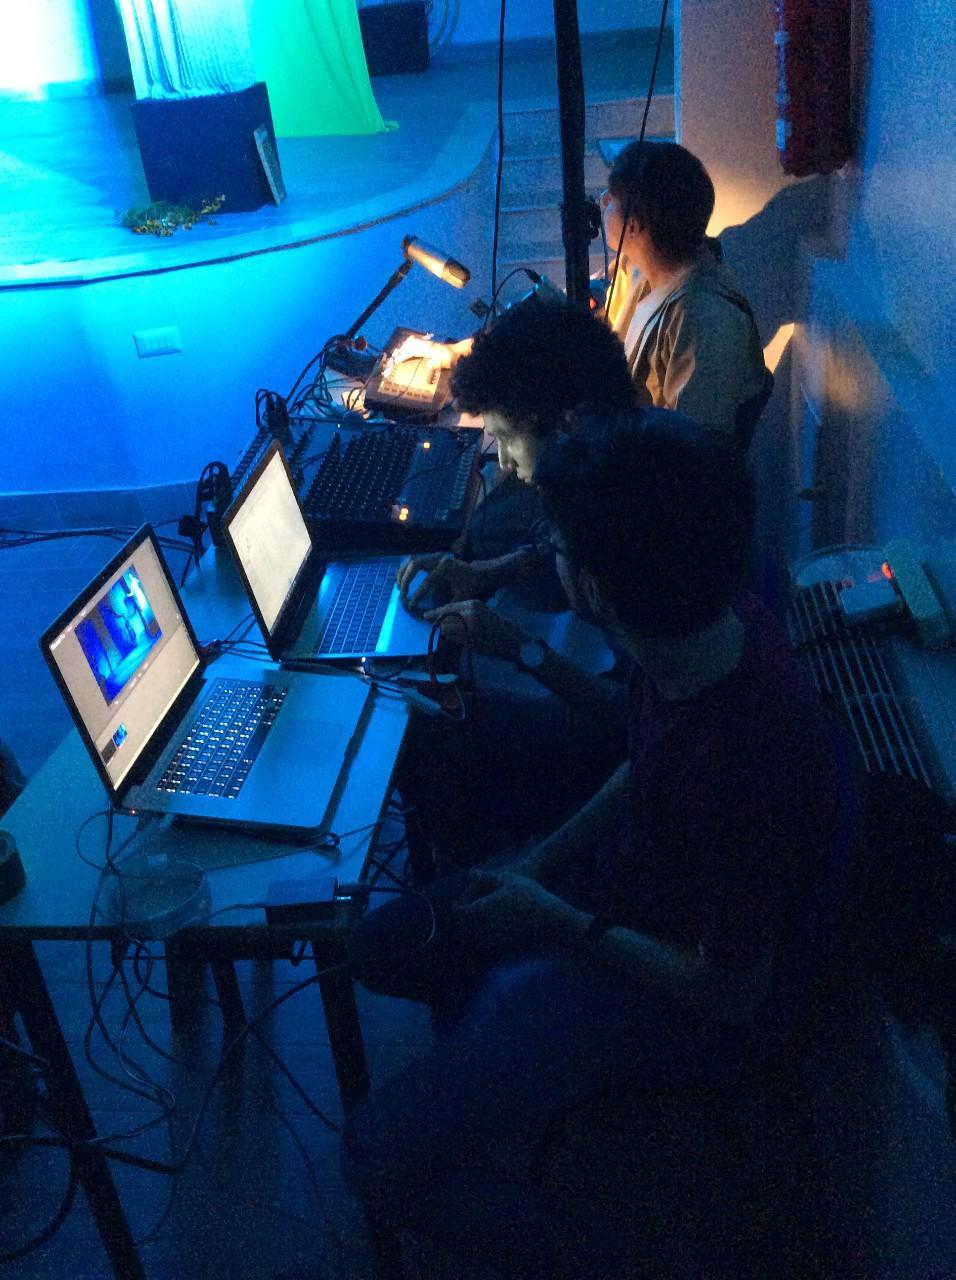 staff_39Ippolito.jpeg.jpeg